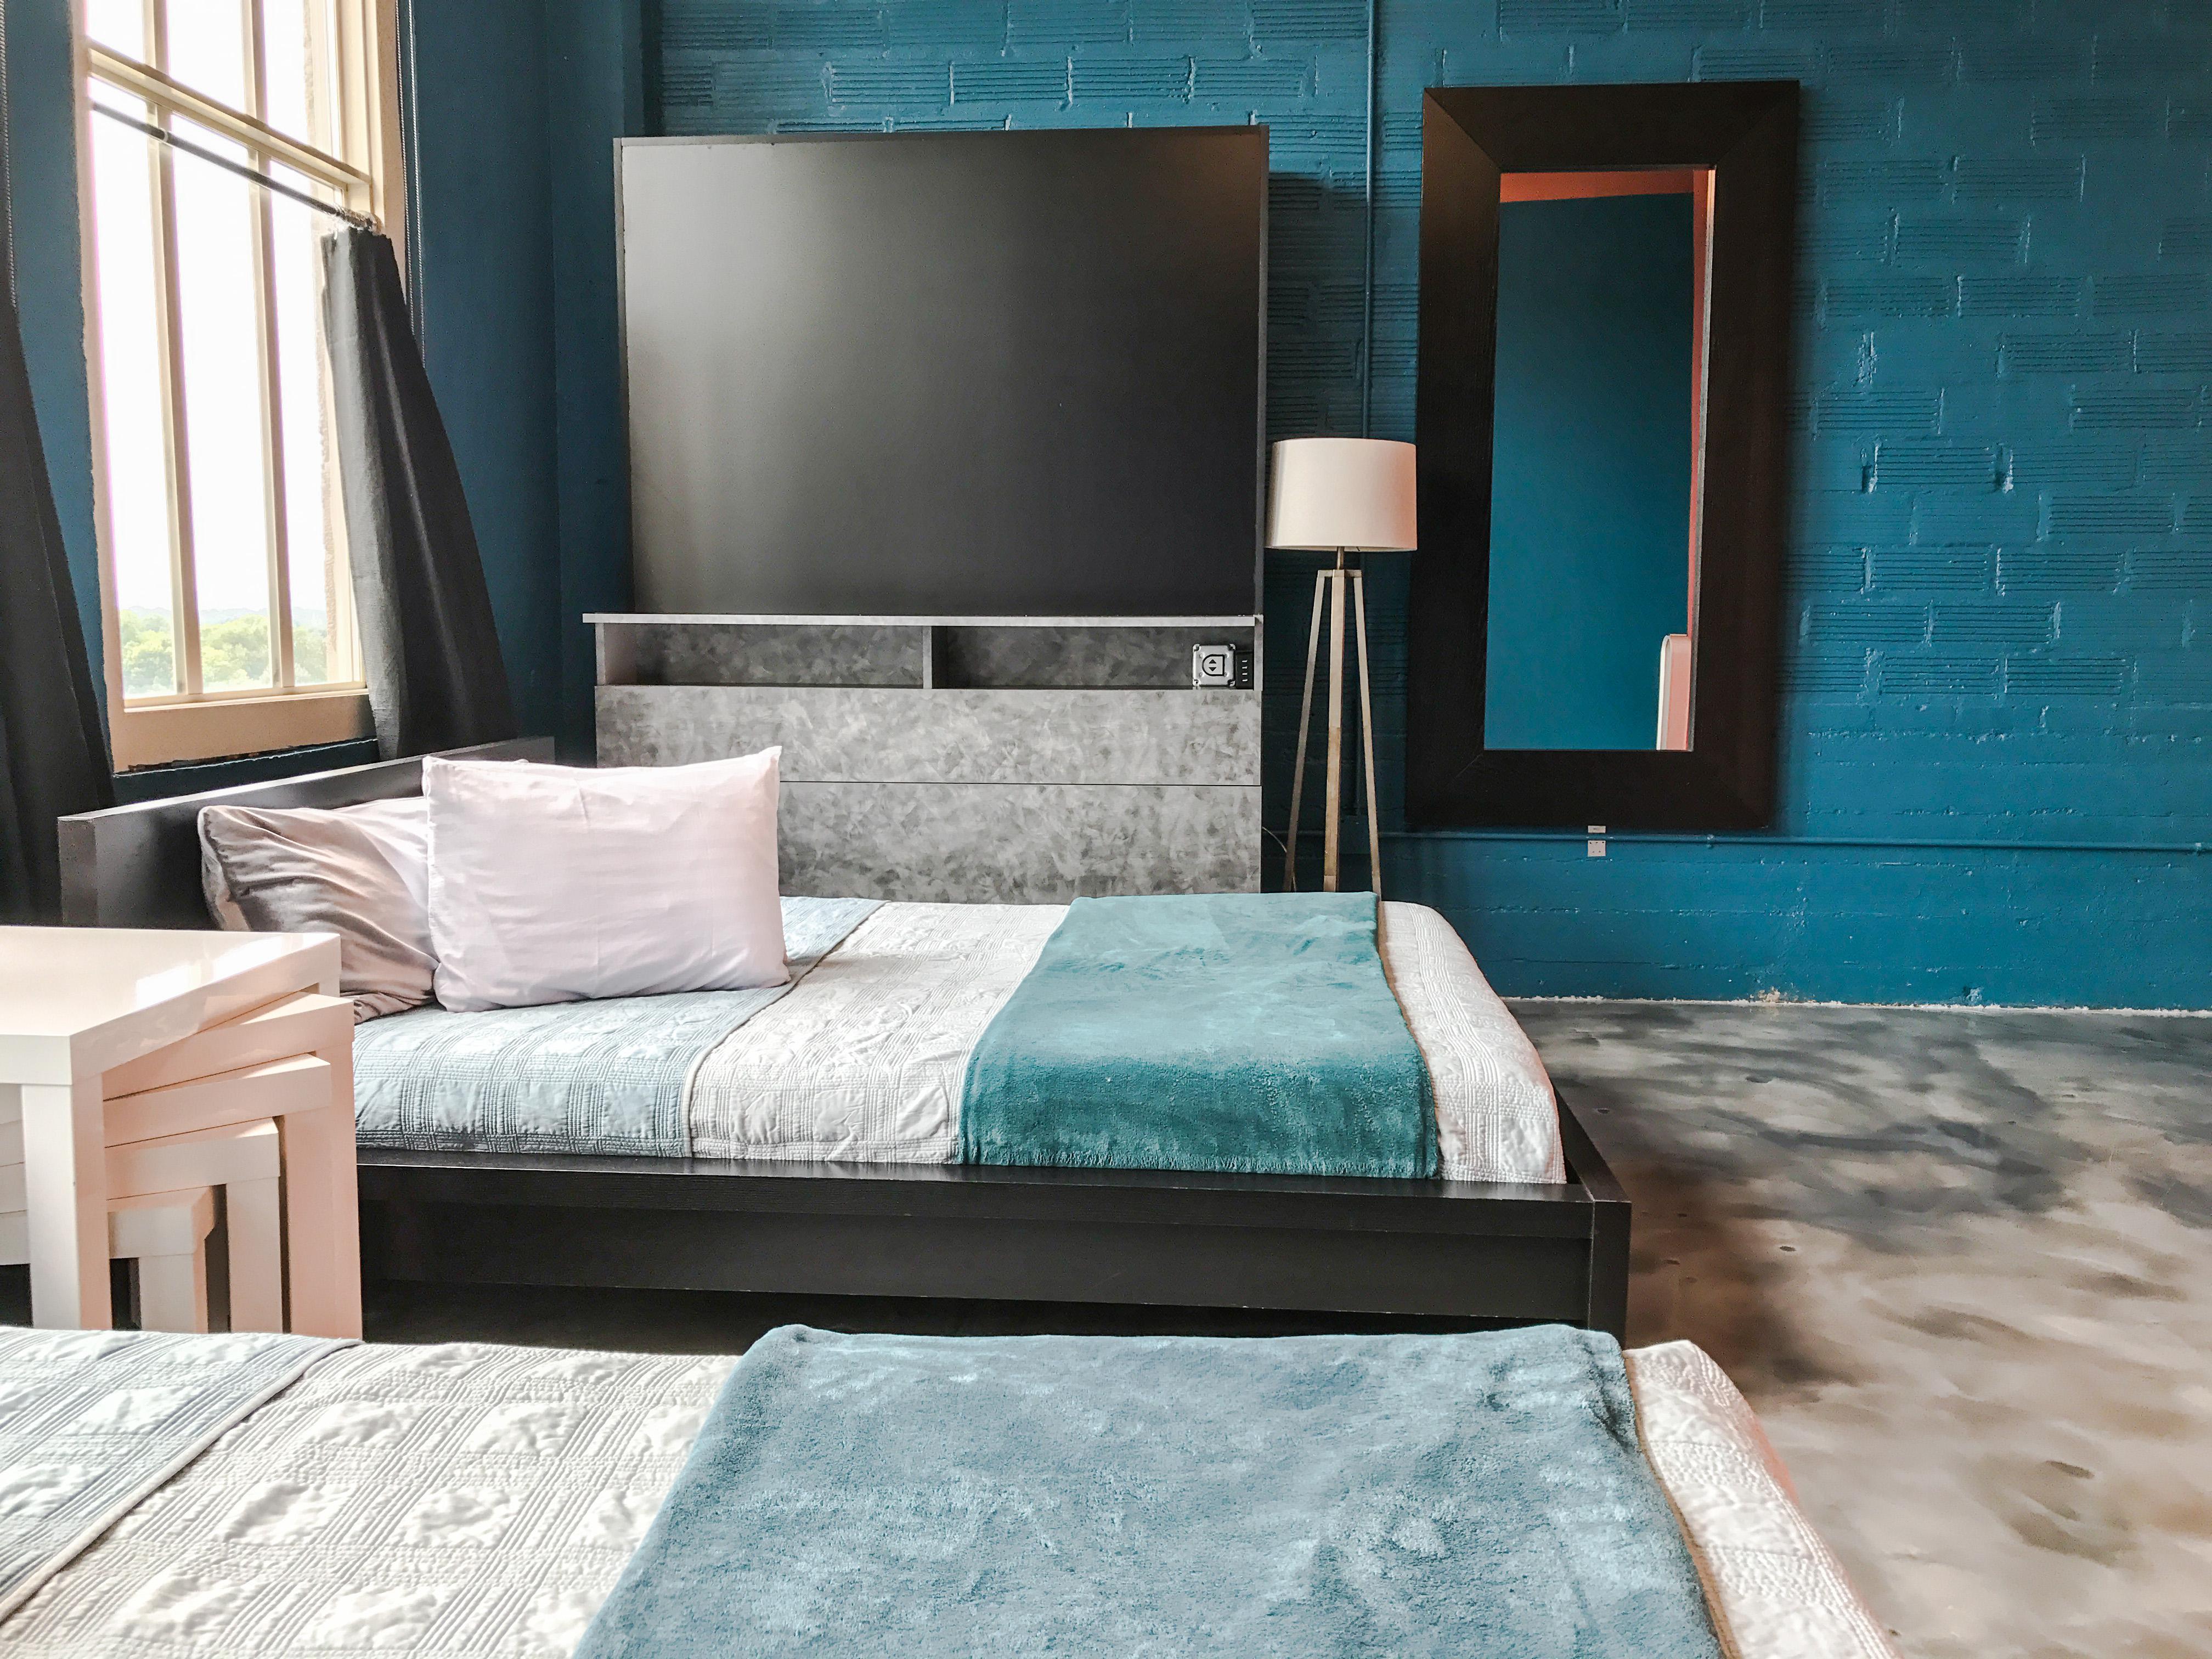 Loft Reverie Hotel 806 - Memory Foam Queen Beds + Lighting + Mirror + Tables + Views